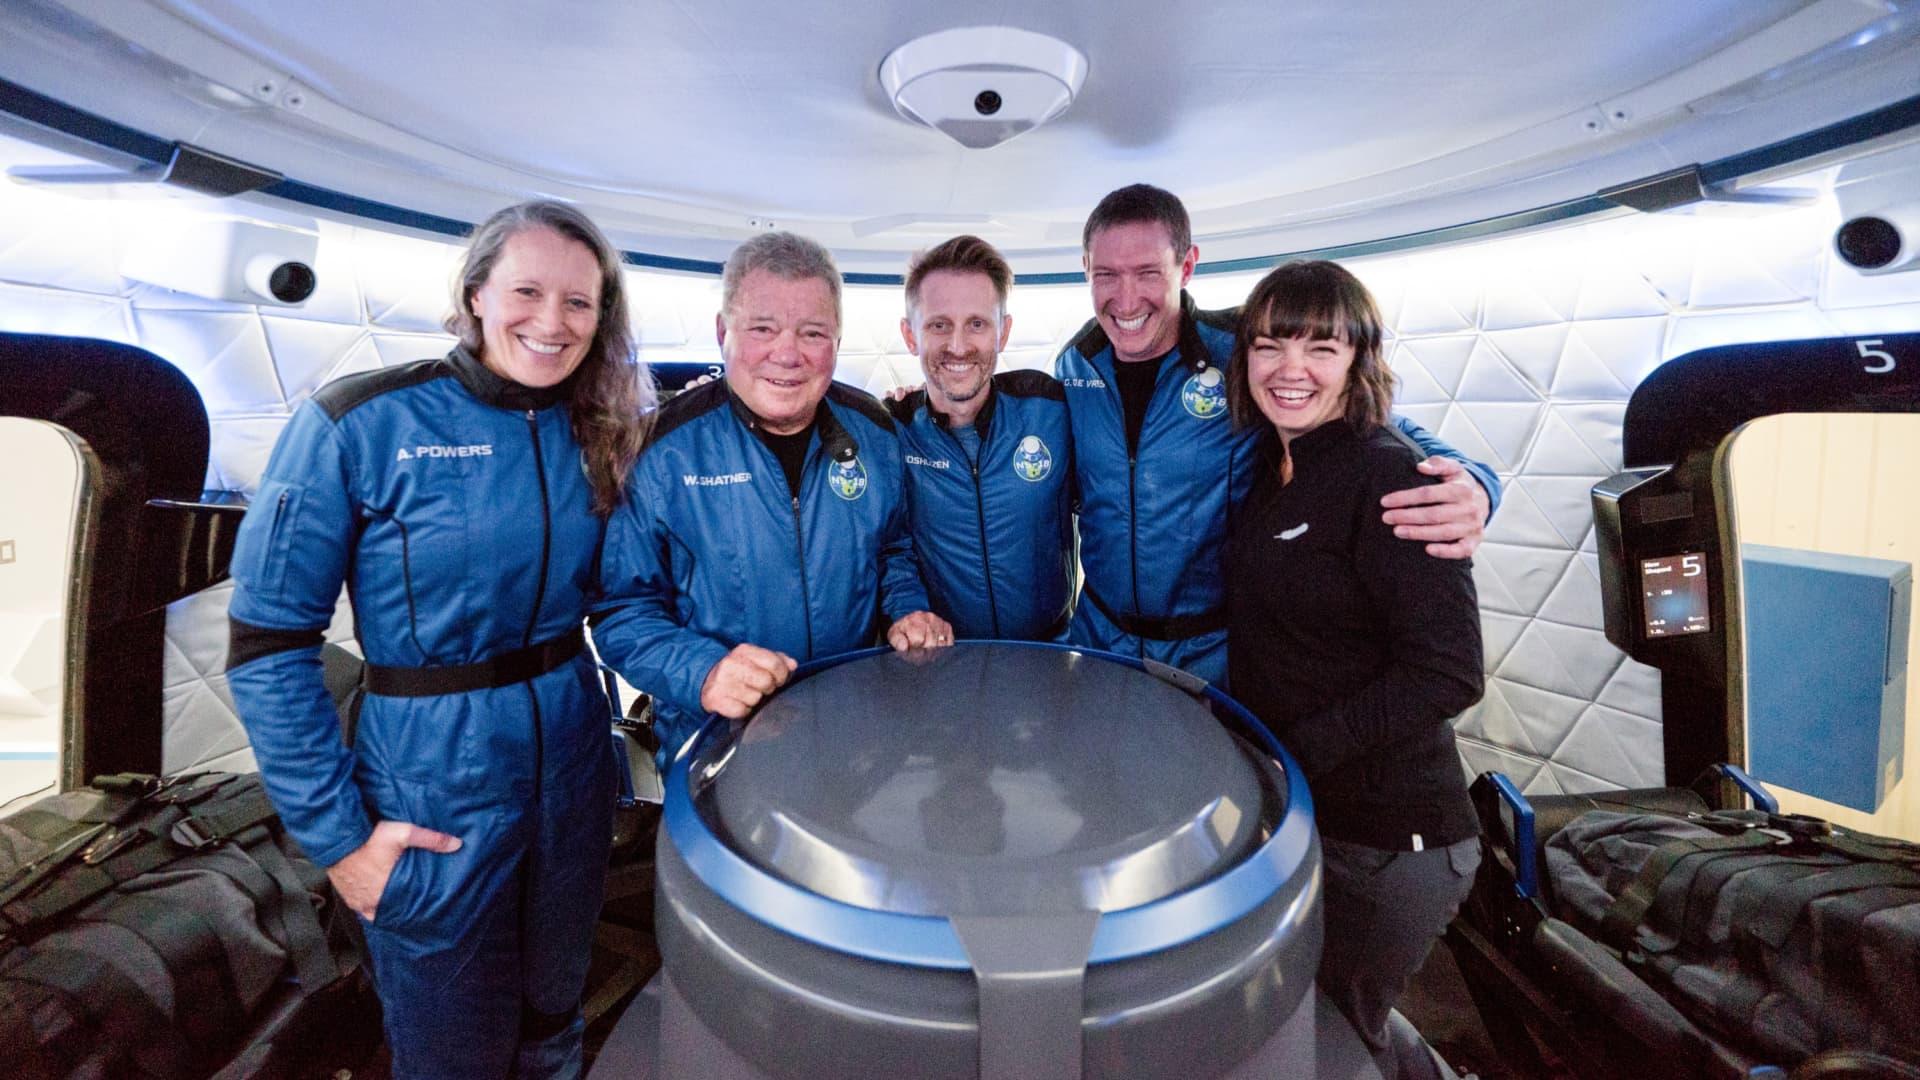 The crew of NS-18, from left: Audrey Powers, William Shatner, Dr. Chris Boshuizen, and Glen de Vries.